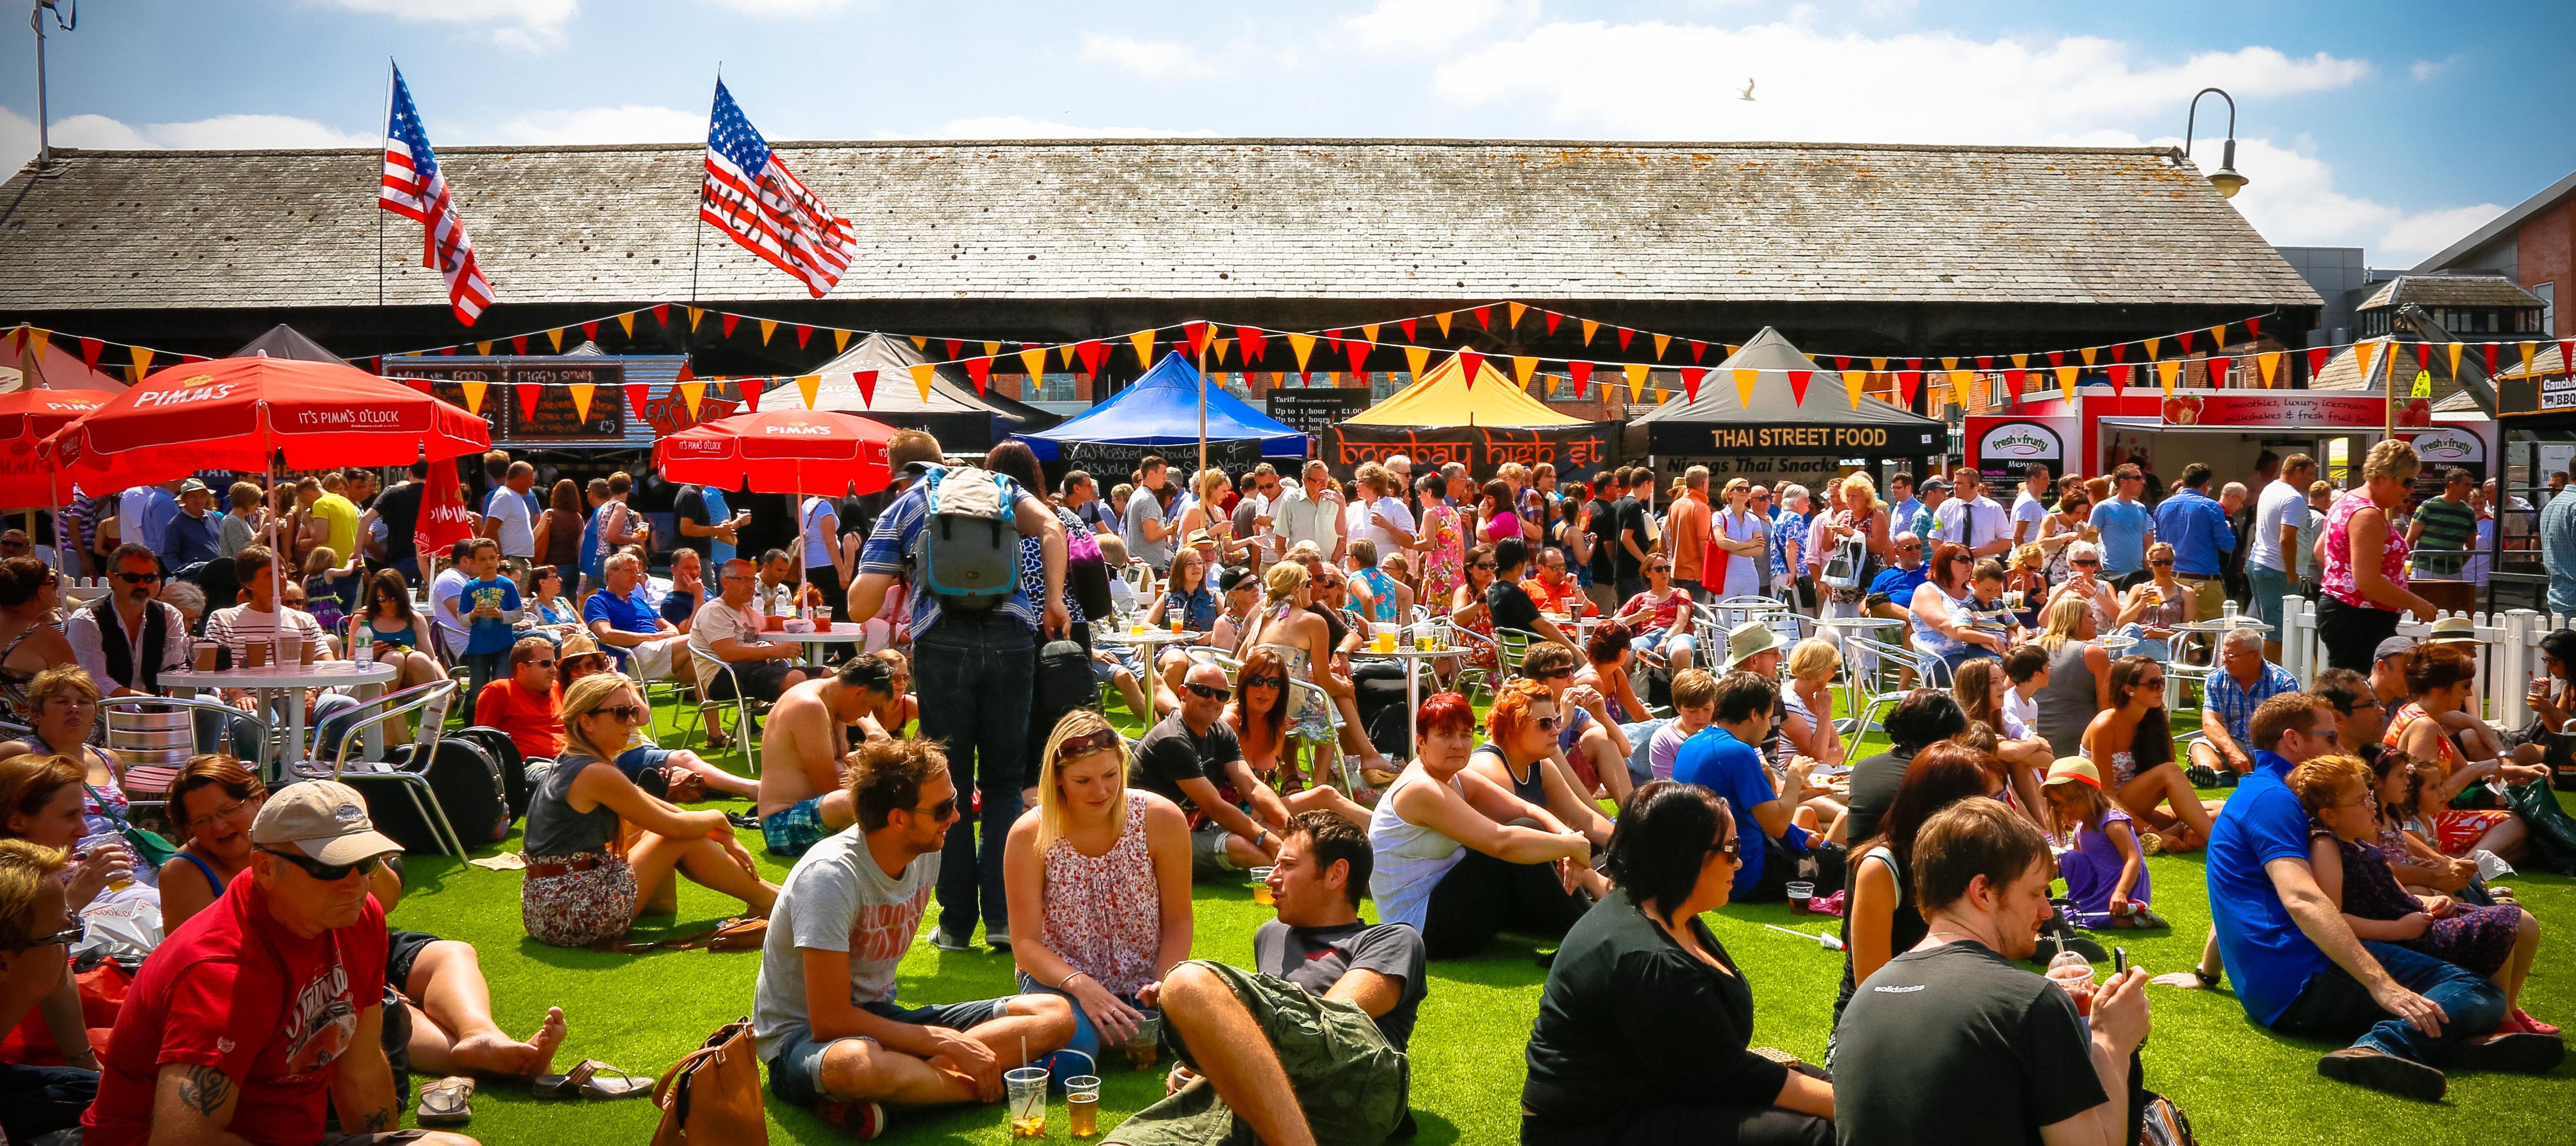 Gloucester Food Festival Luxury Cotswold Rentals